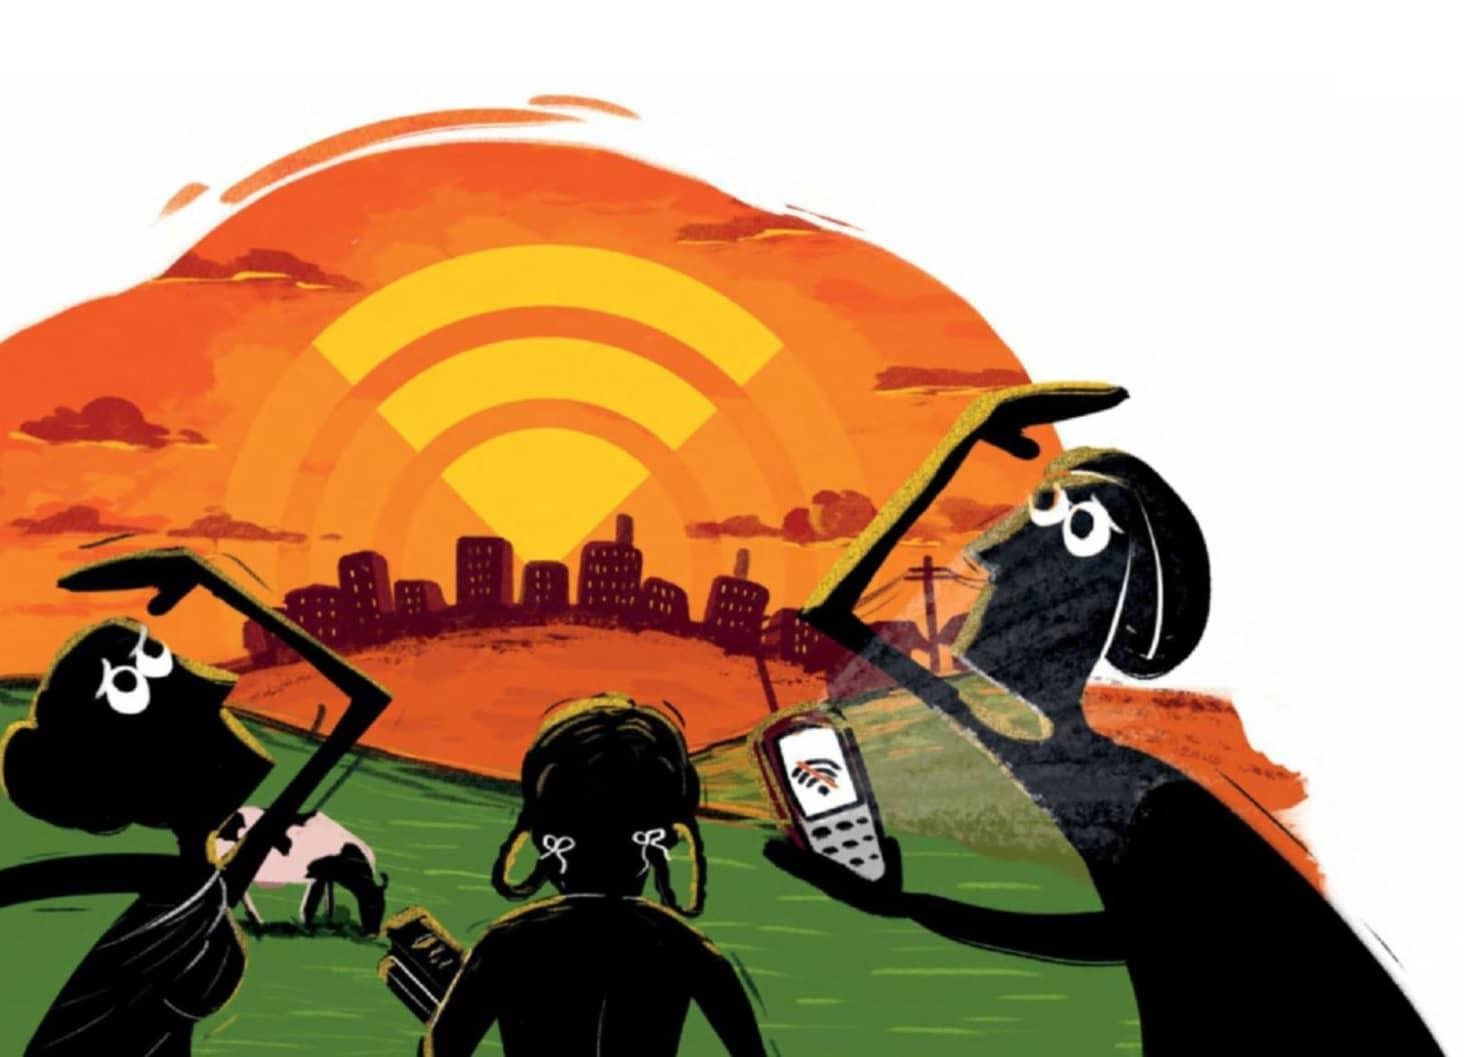 The great digital divide